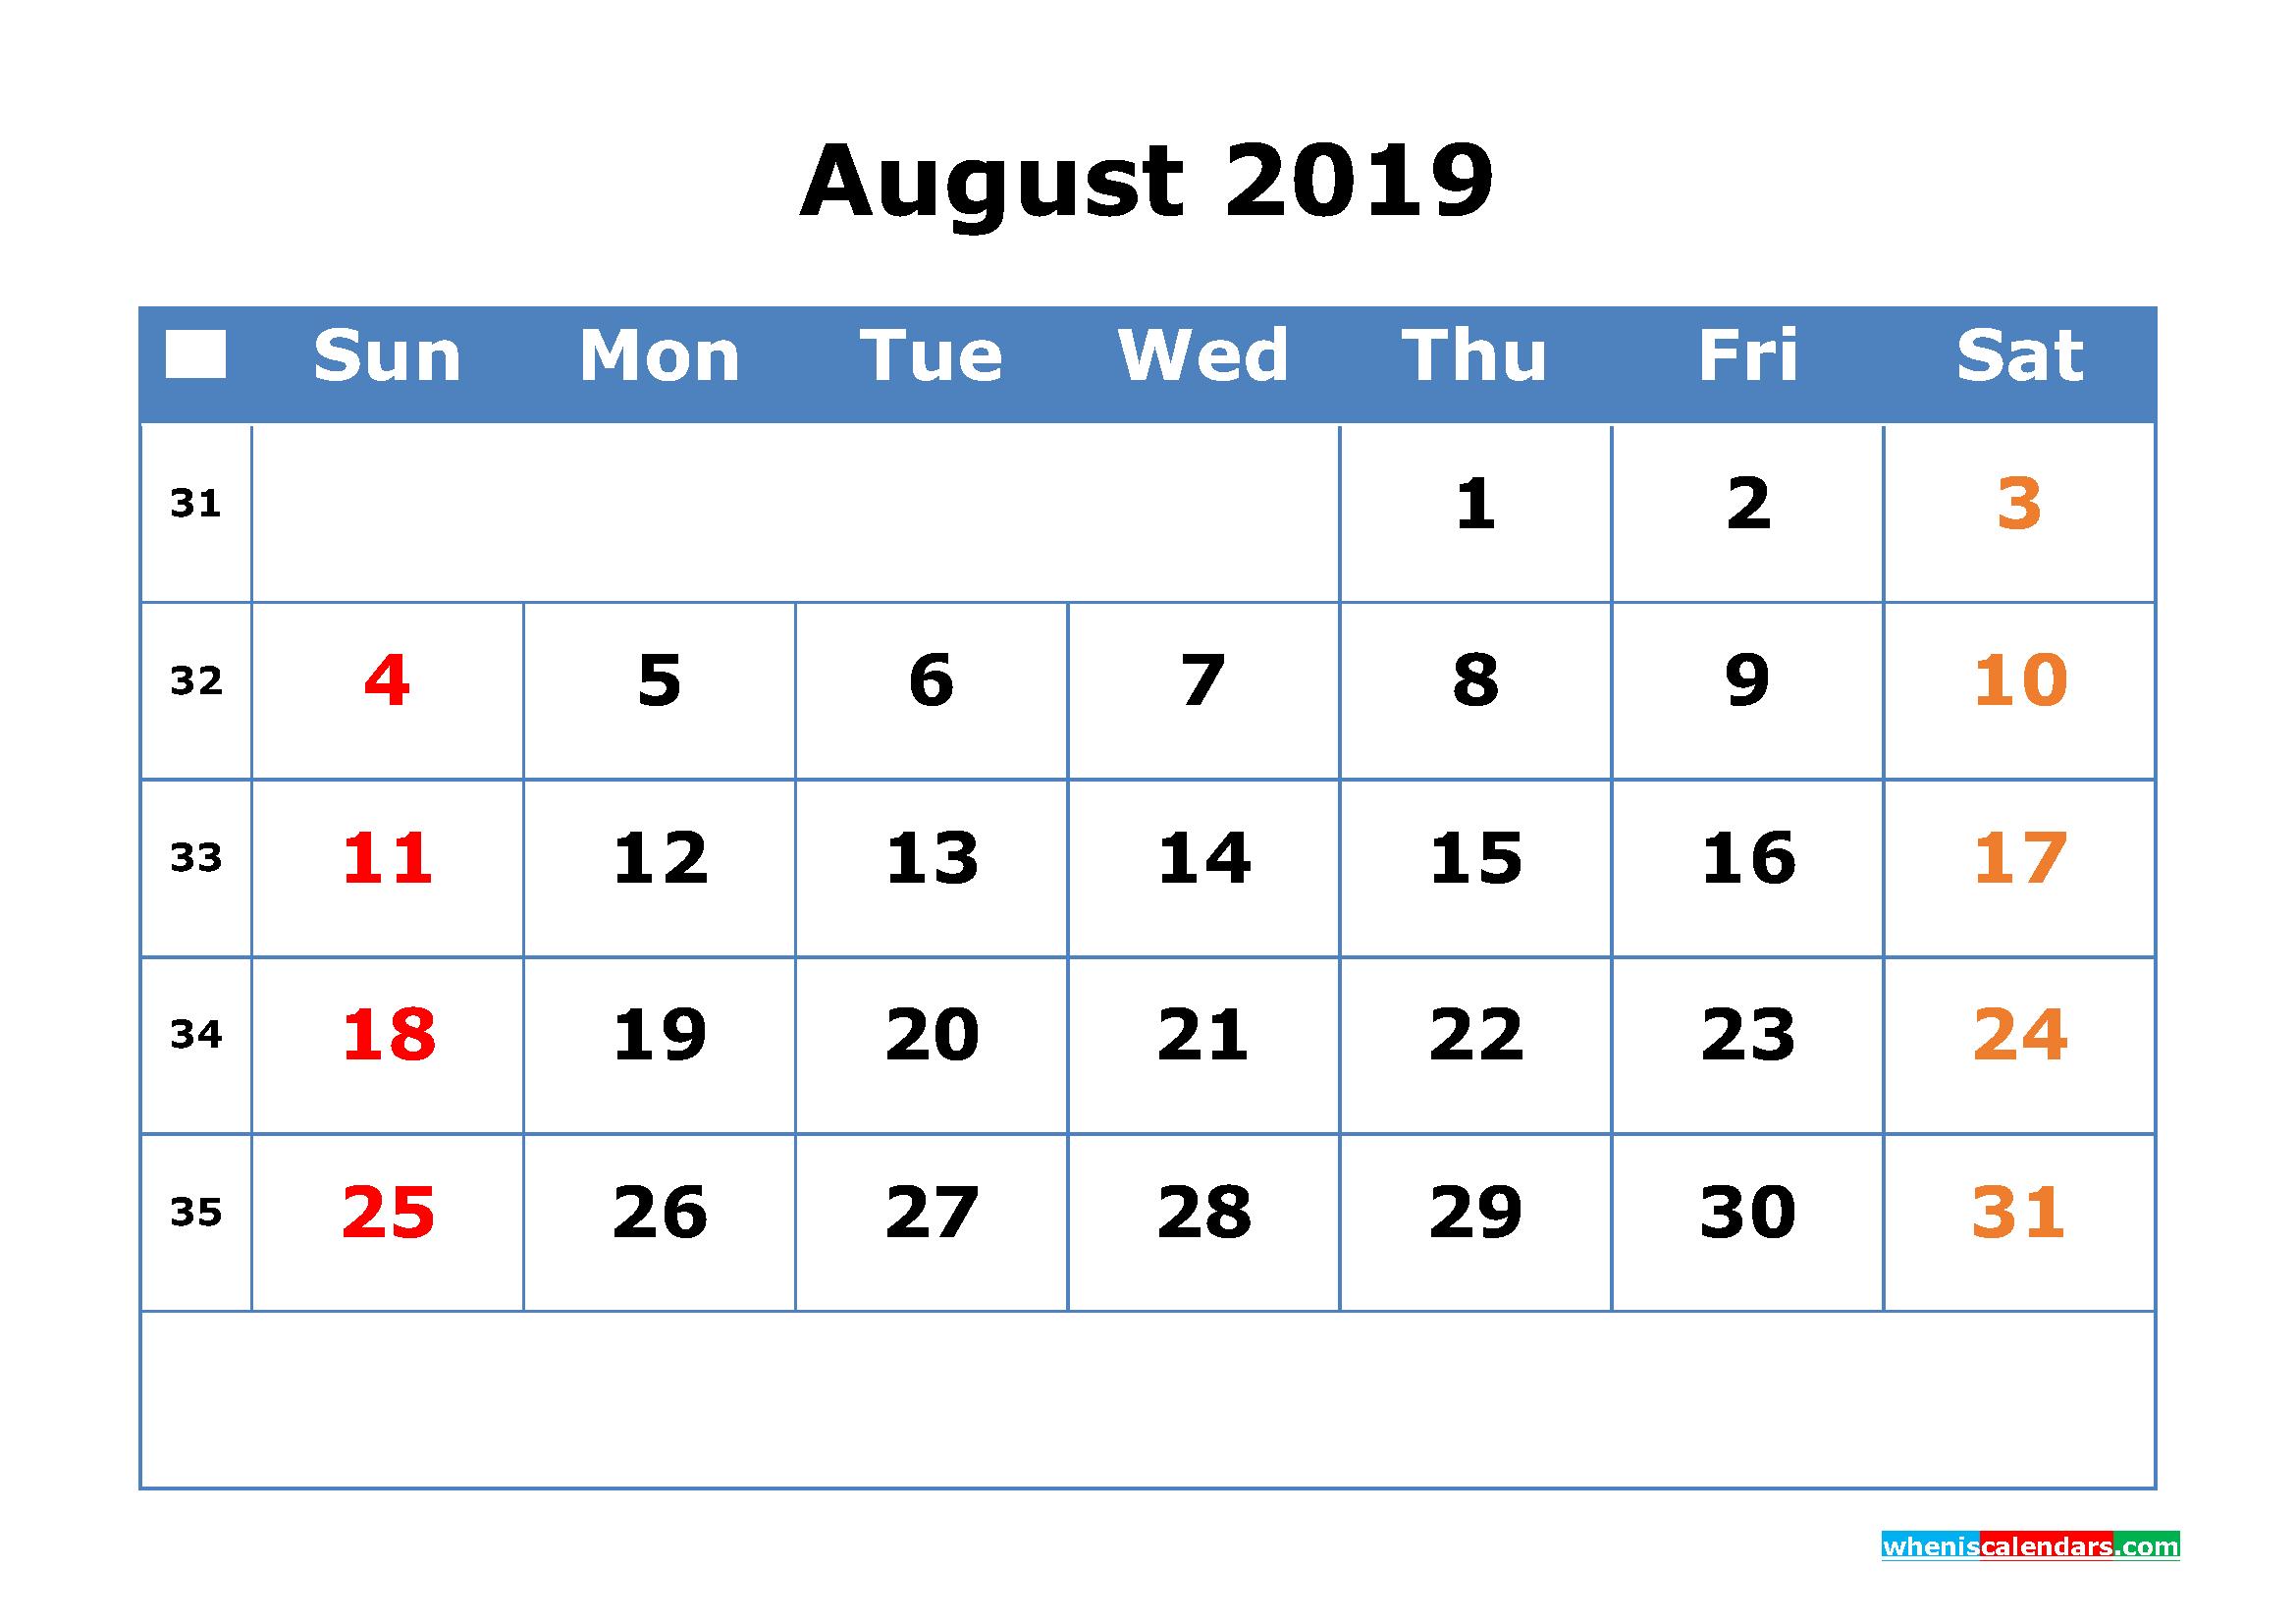 Printable Calendar 2019 August for Free Download as PDF, JPG